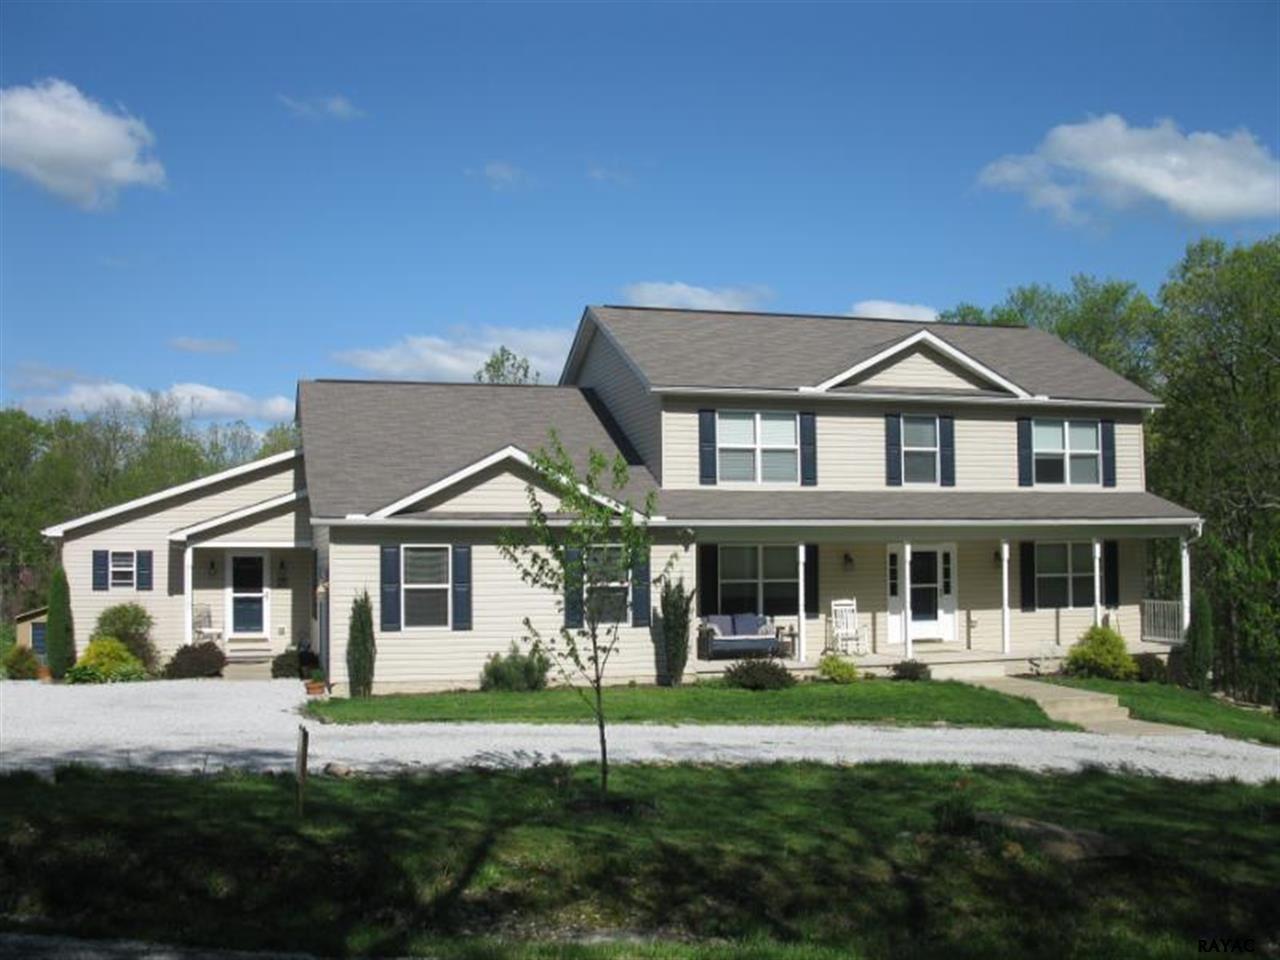 701 Mcglaughlin Rd, Fairfield, PA 17320